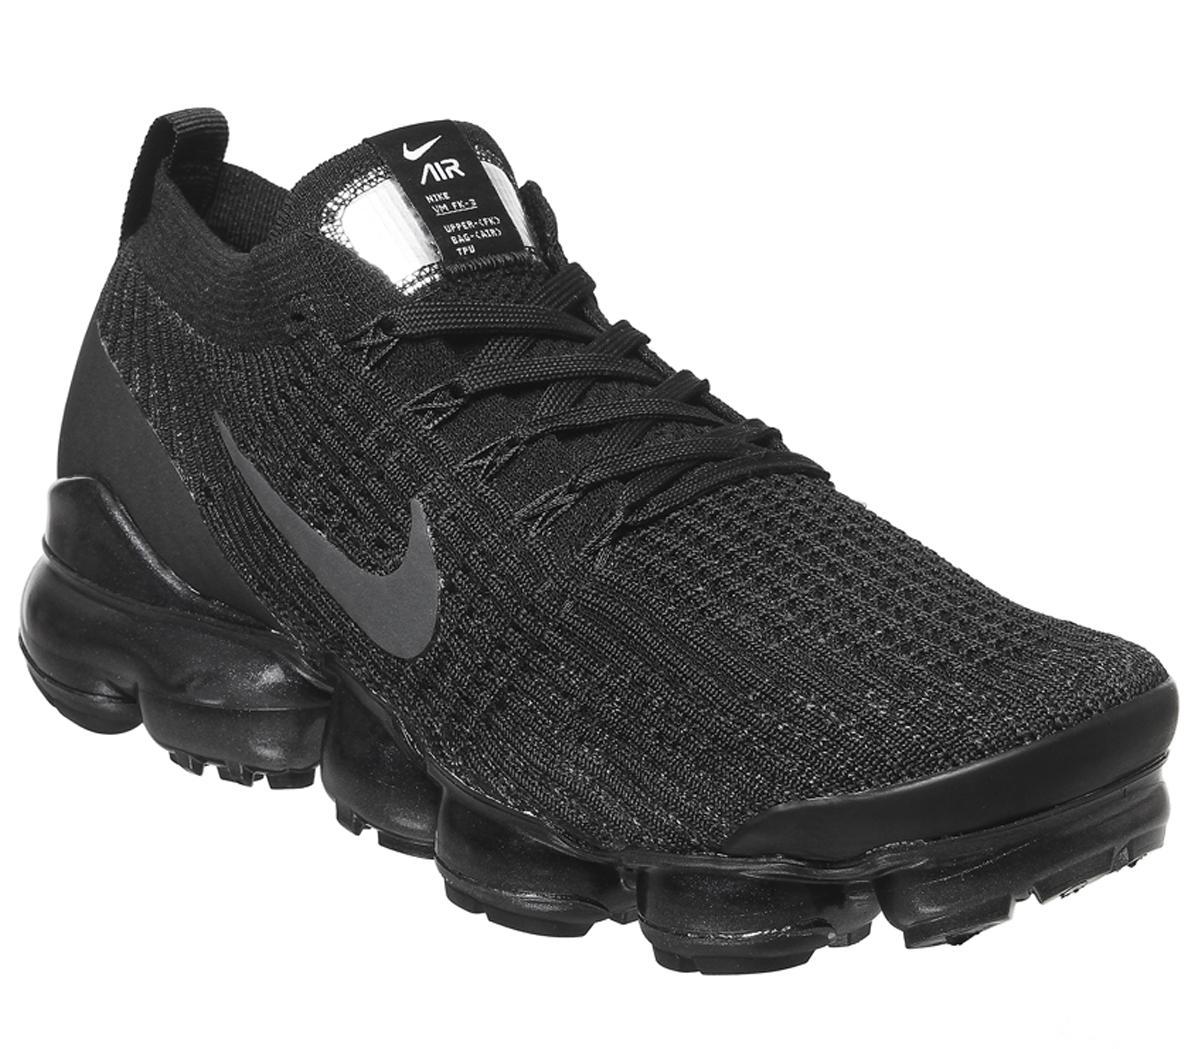 Nike Air Vapormax Fk 3 Trainers Black